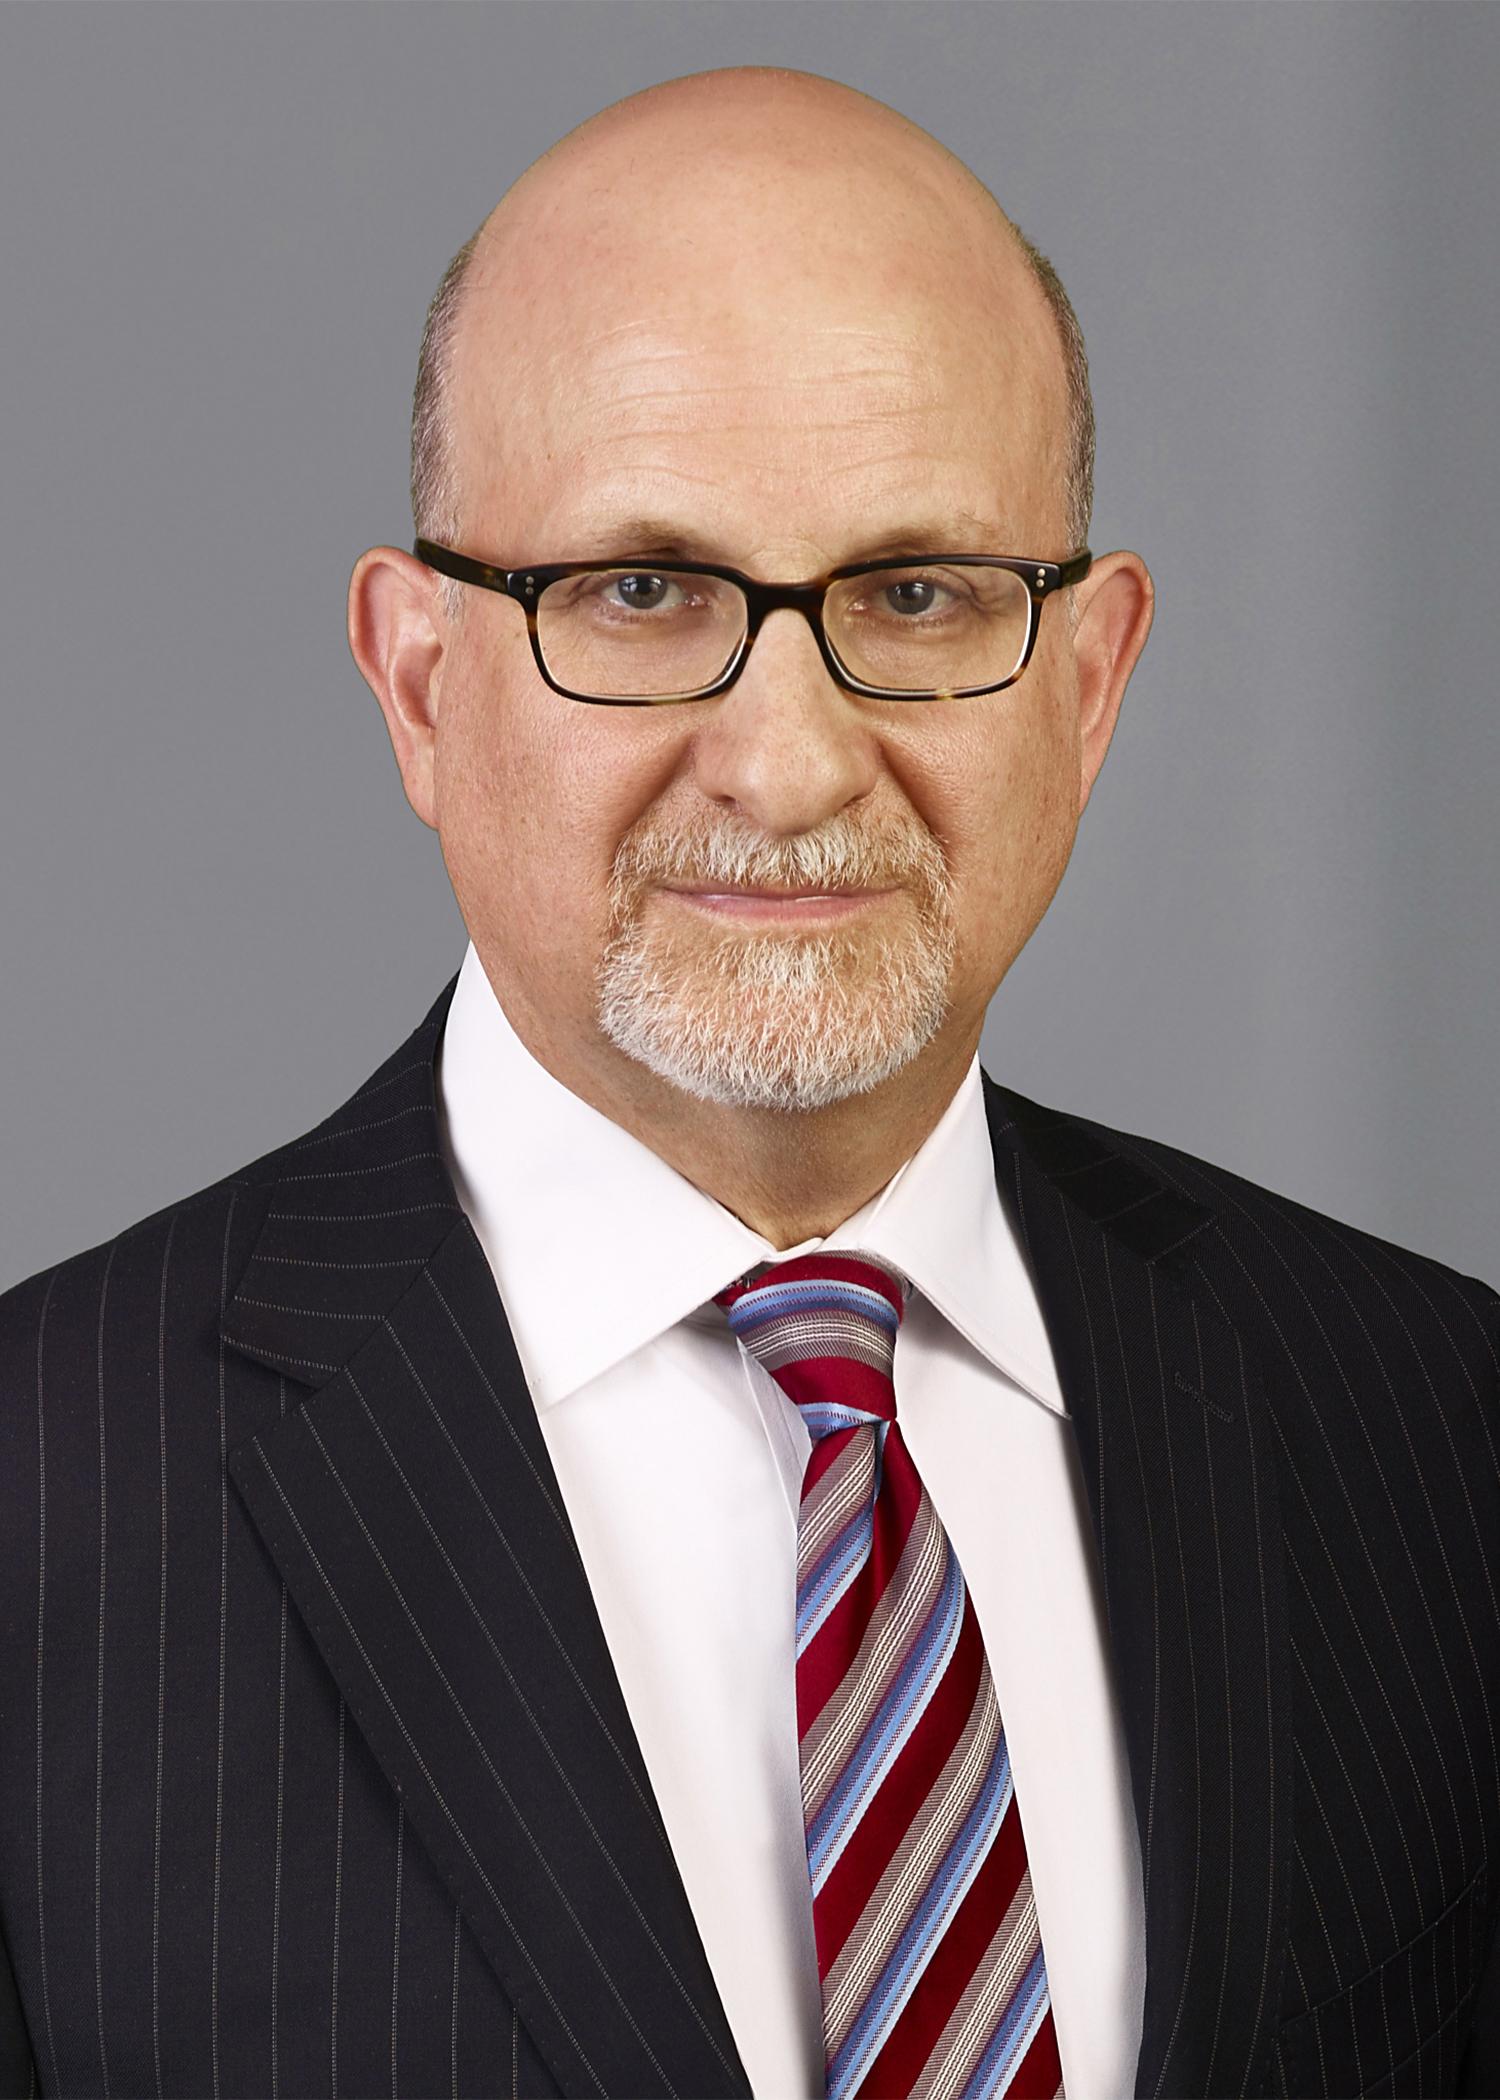 Matthew R. Alter